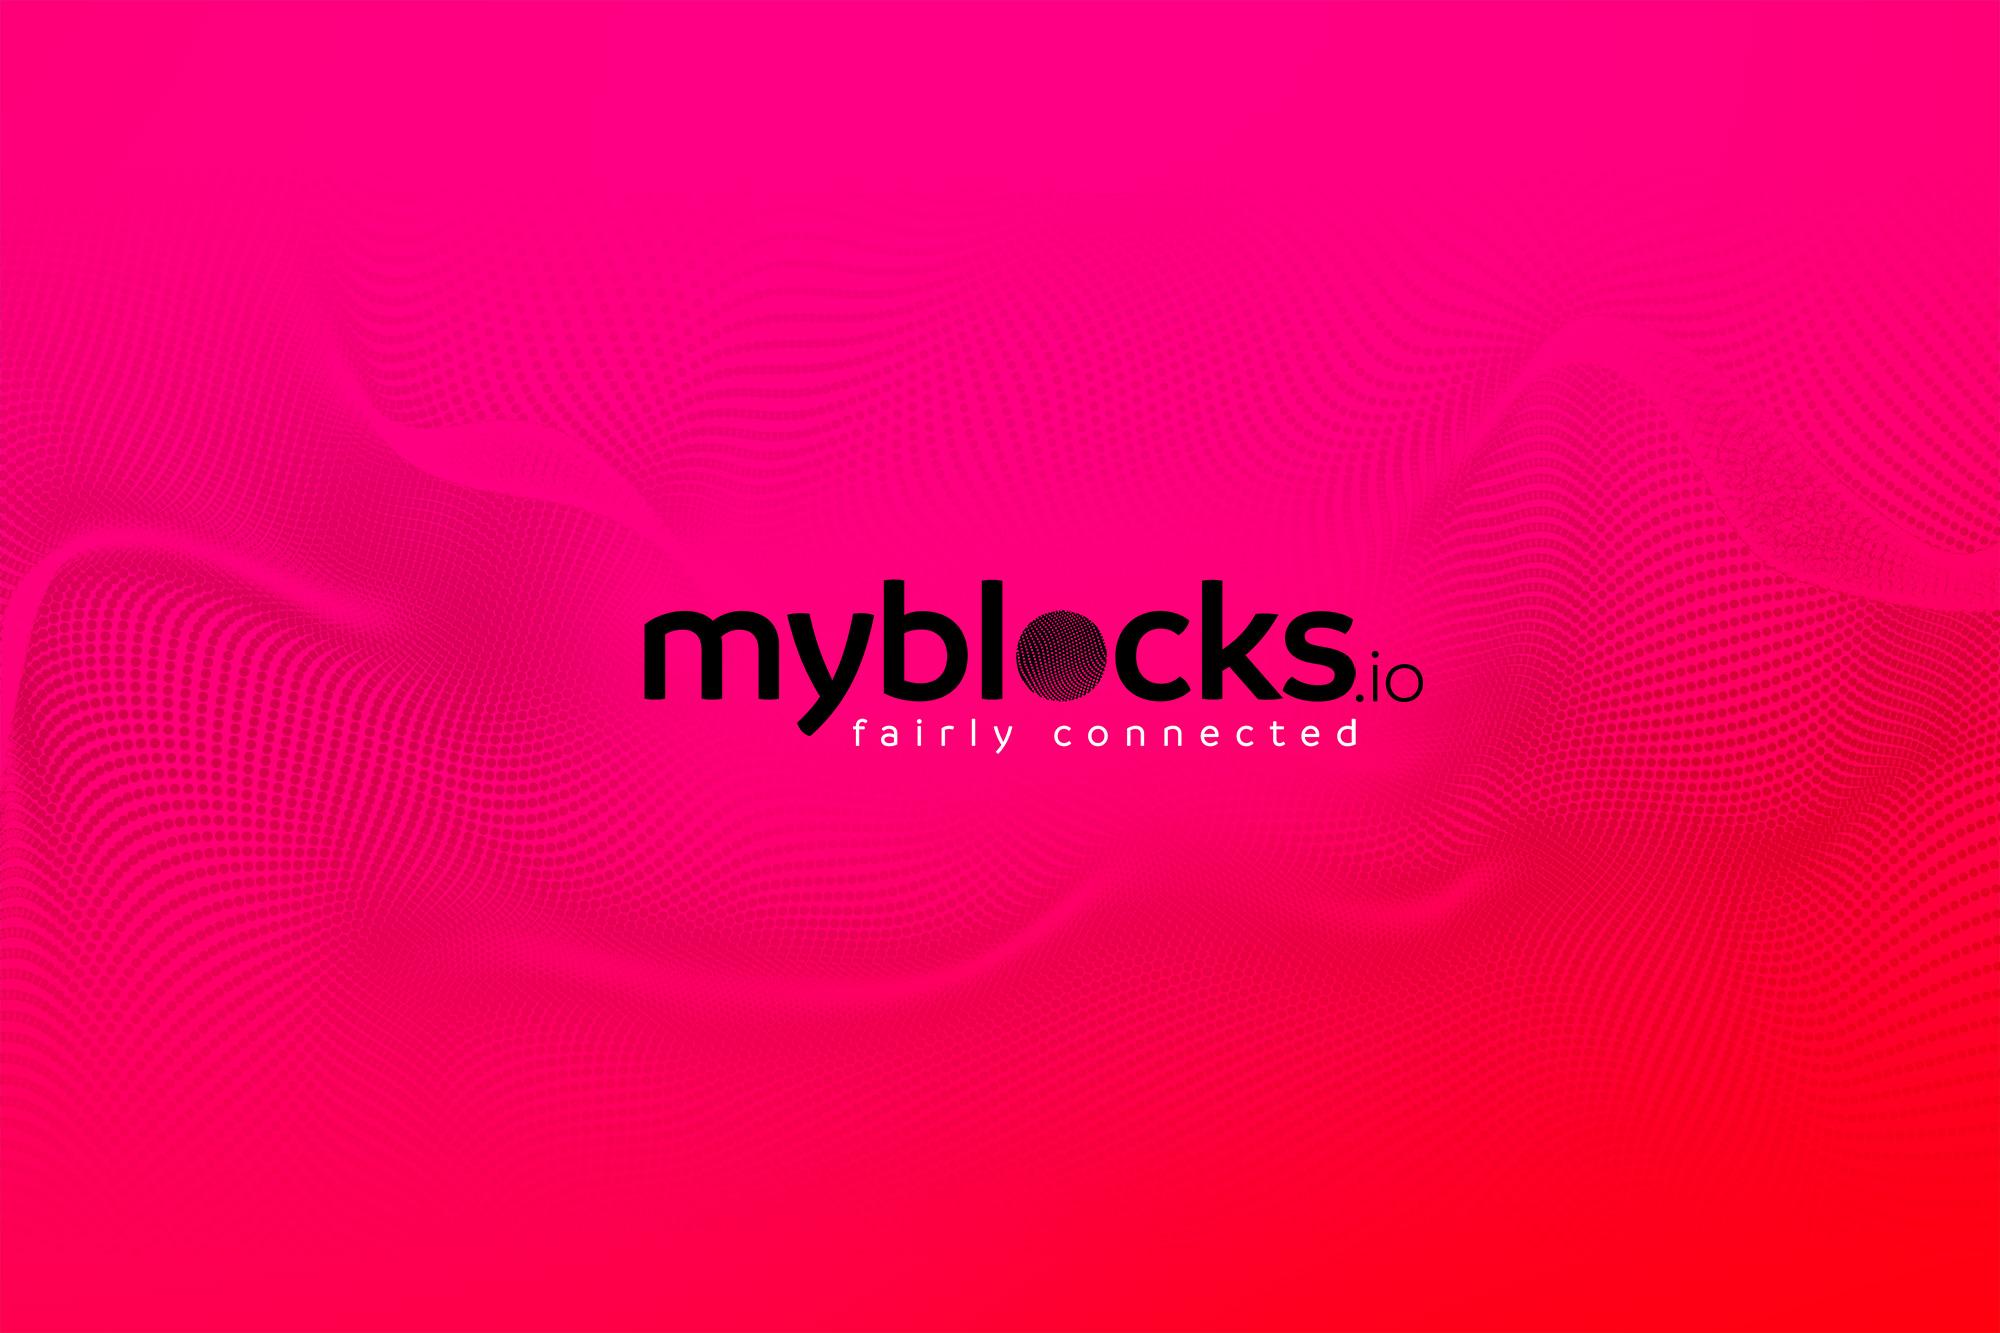 quentin_paquignon-branding-visual_identity-myblocks_01.jpg